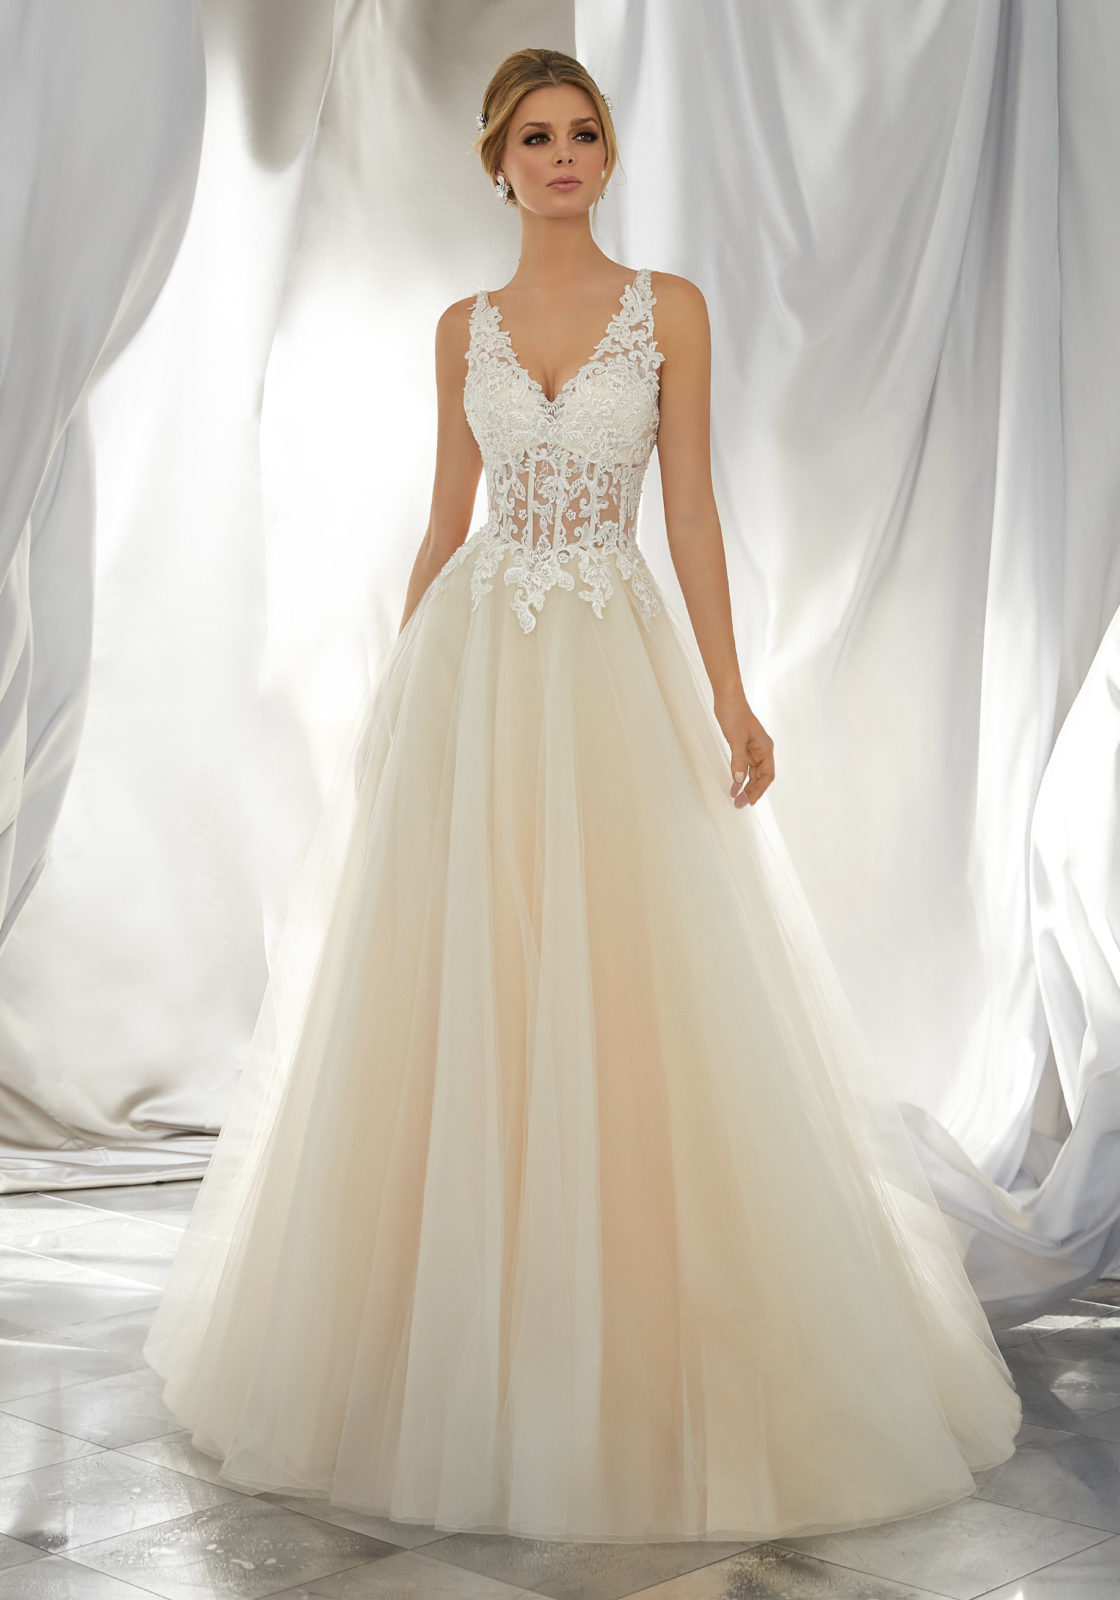 China V-Neck Bridal Dress A-Line Beach Garden Wedding Gown W1949 - China Wedding  Dress 8b66bca99